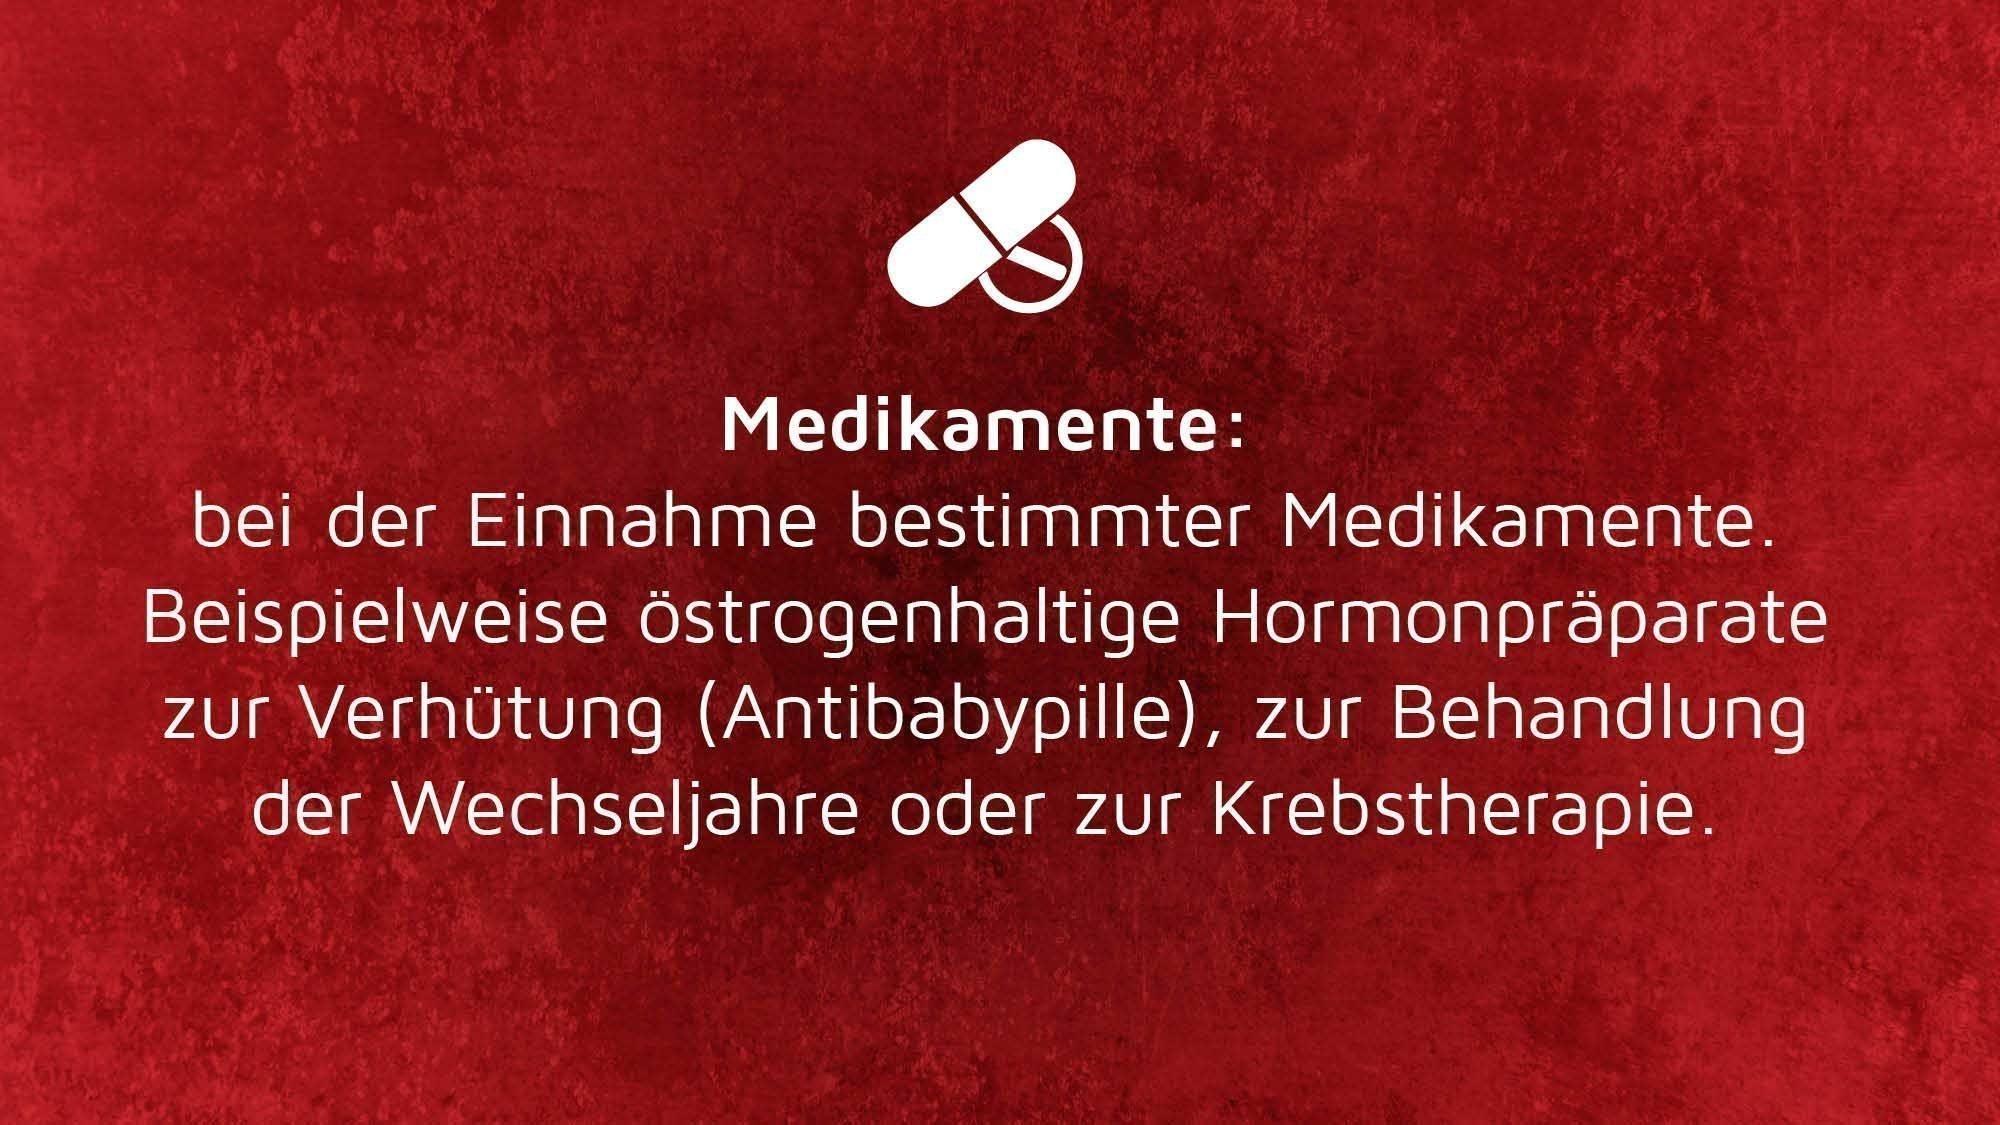 Risikofaktoren Thrombose: Medikamente